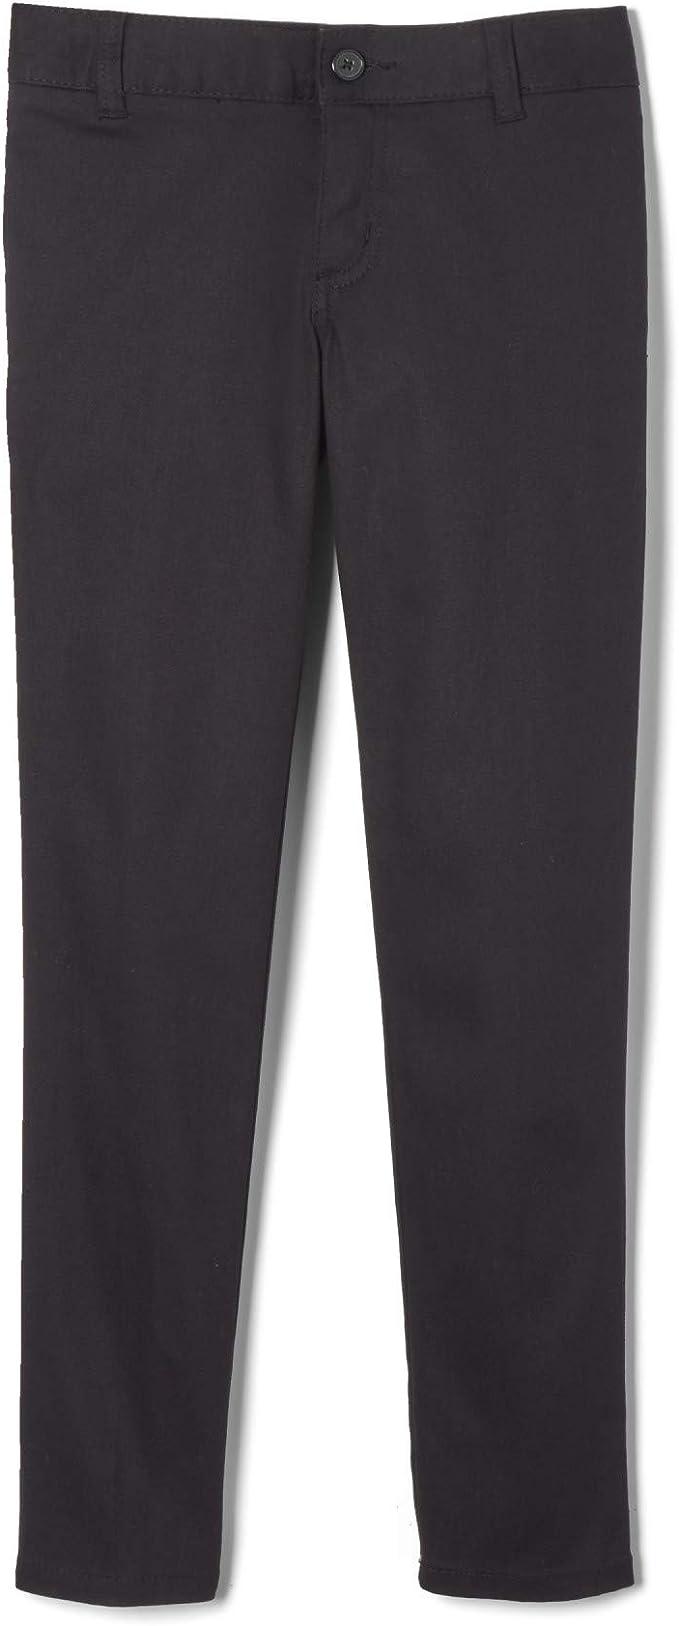 Nautica Little Girls Flat Front Stretch Capri Pants